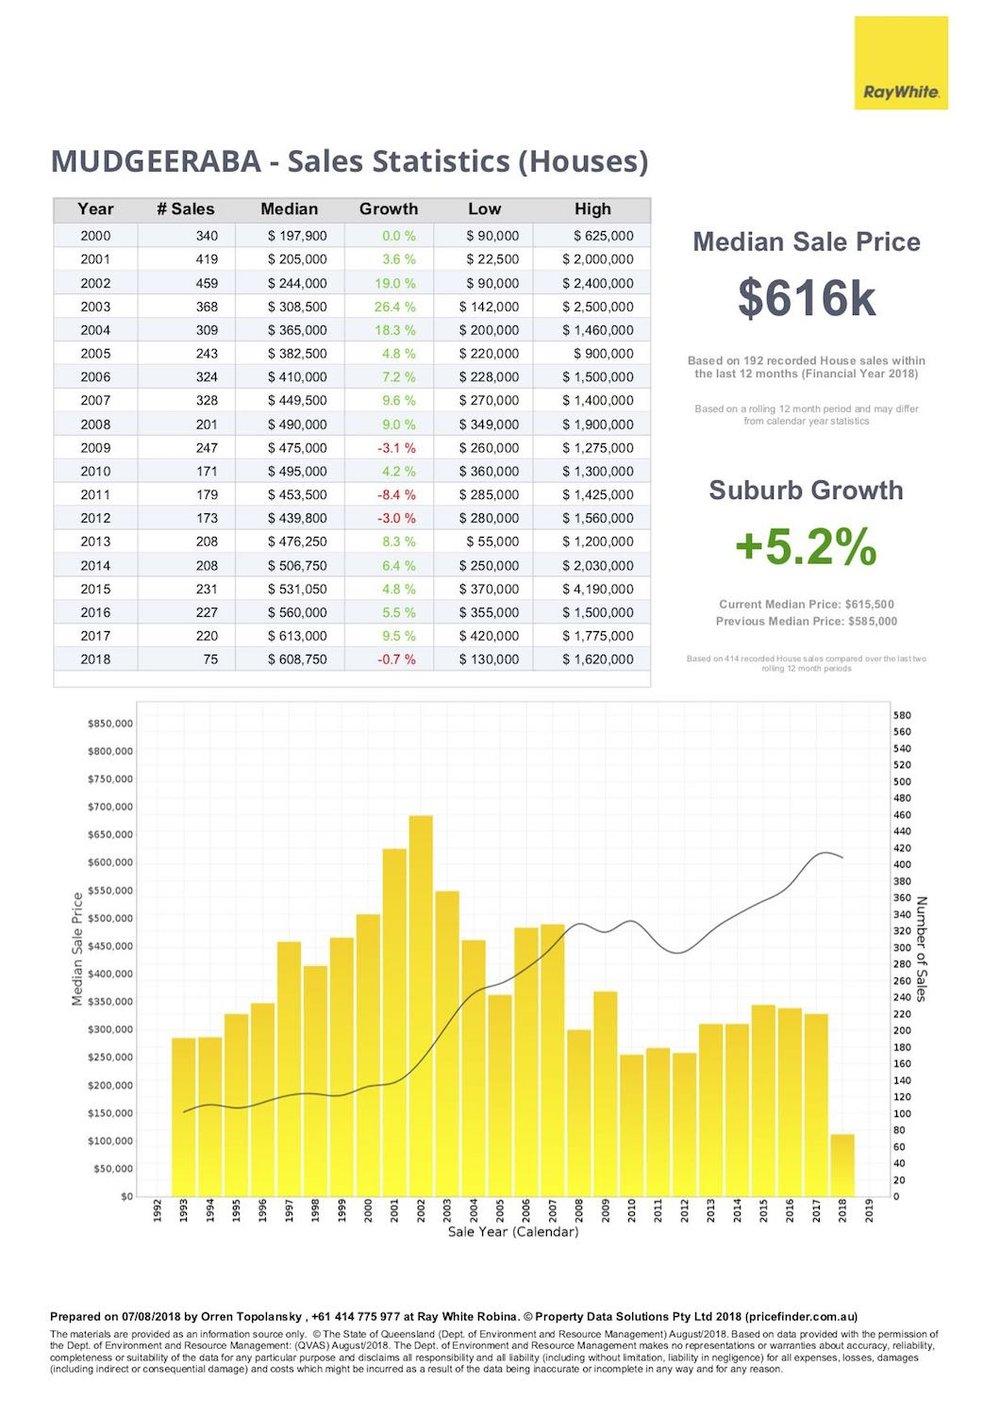 Mudgeeraba house sales statistics